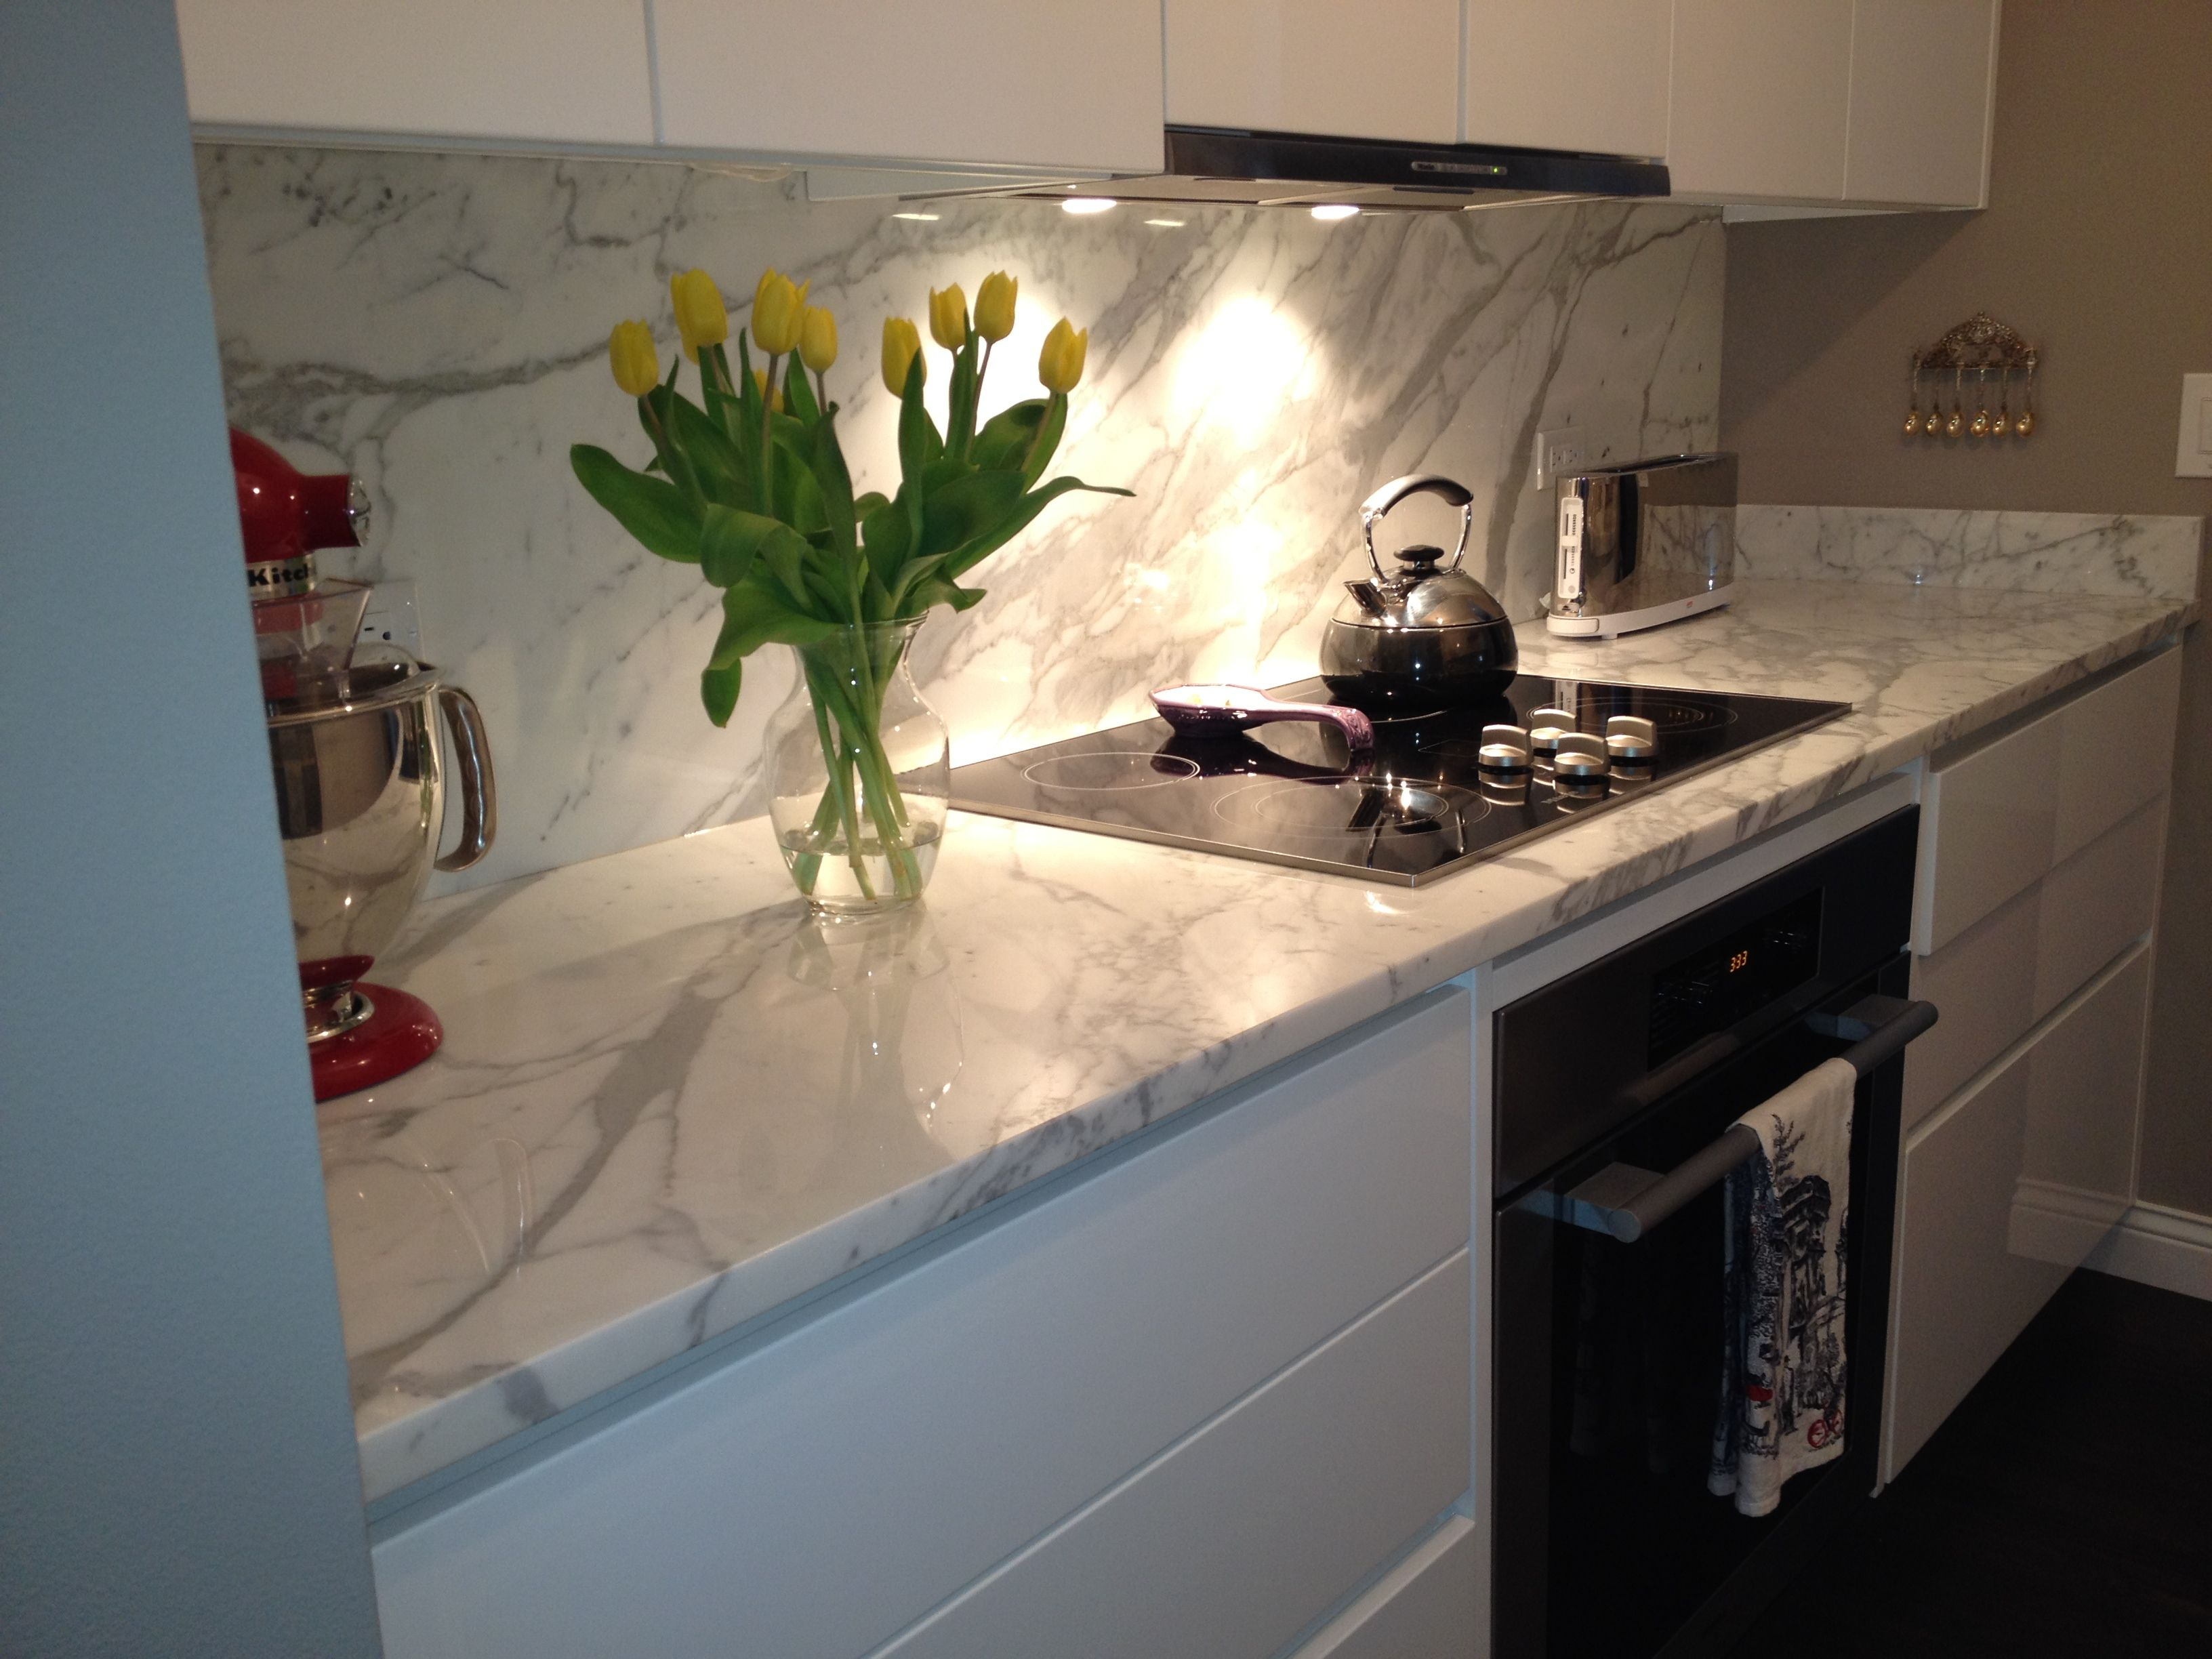 White Calacatta Italian Marble Countertop German Miele Kitchen Liances American Stand Kitchenaid Mixer